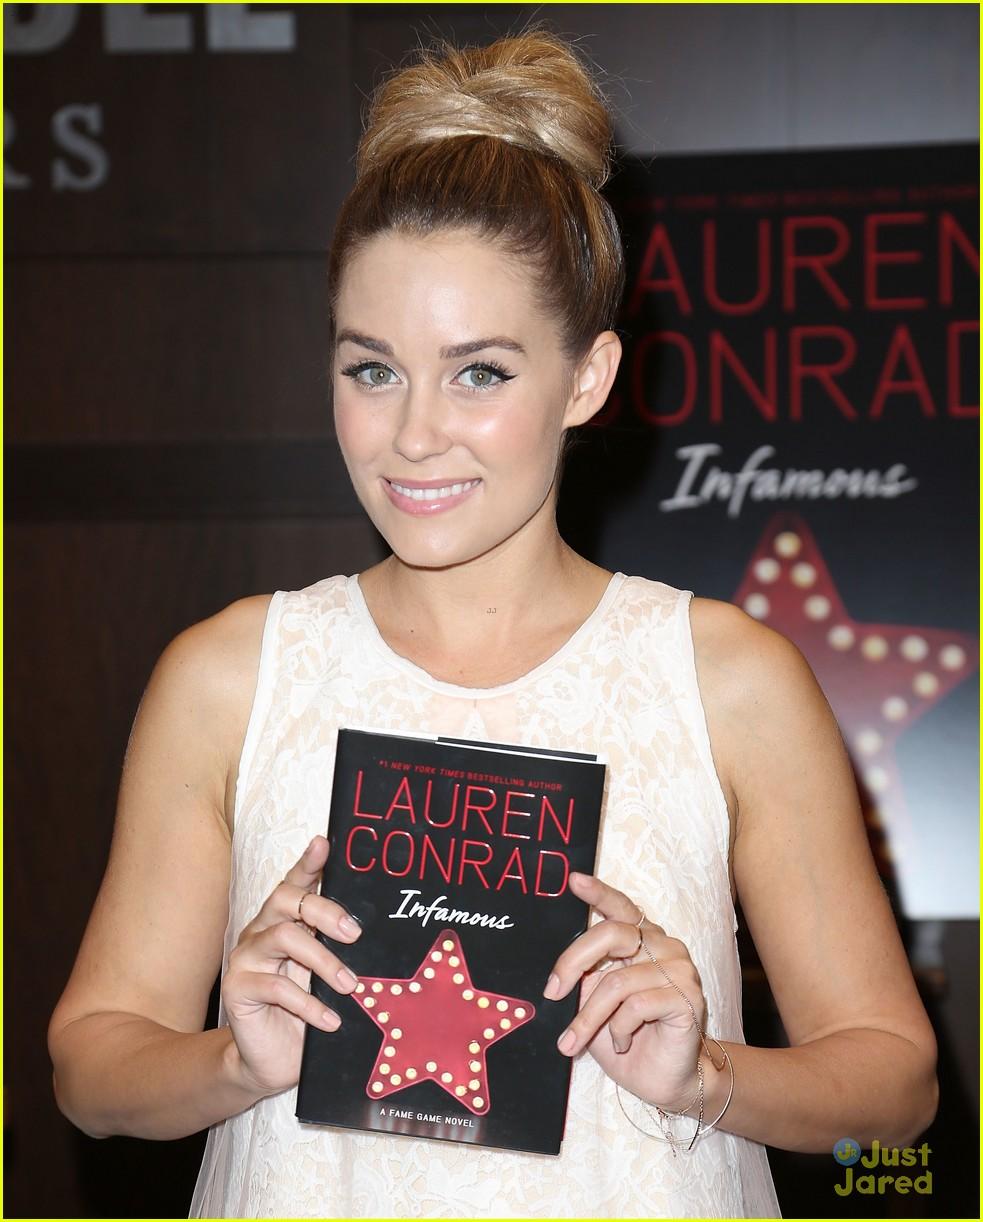 lauren conrad infamous book signing 04